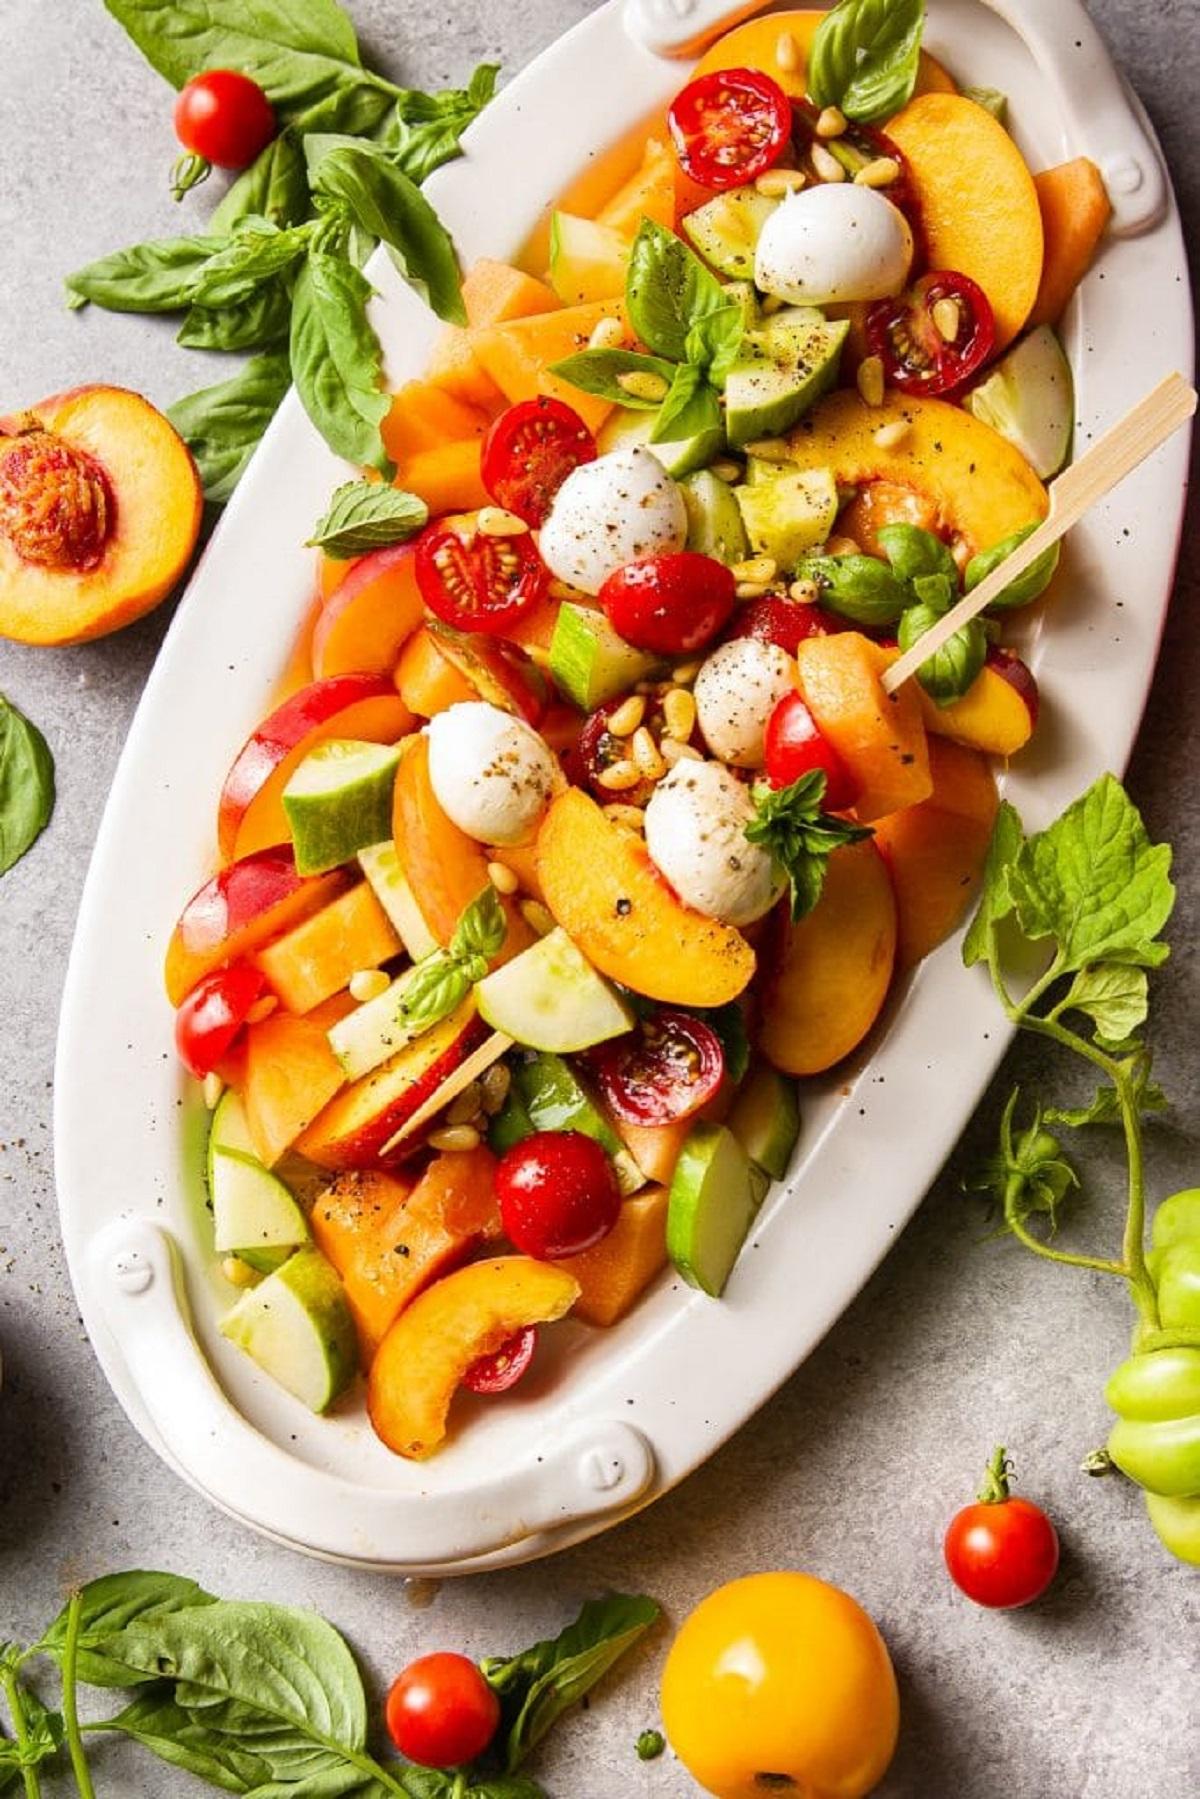 Cantaloupe peach fruit salad on a white oval platter